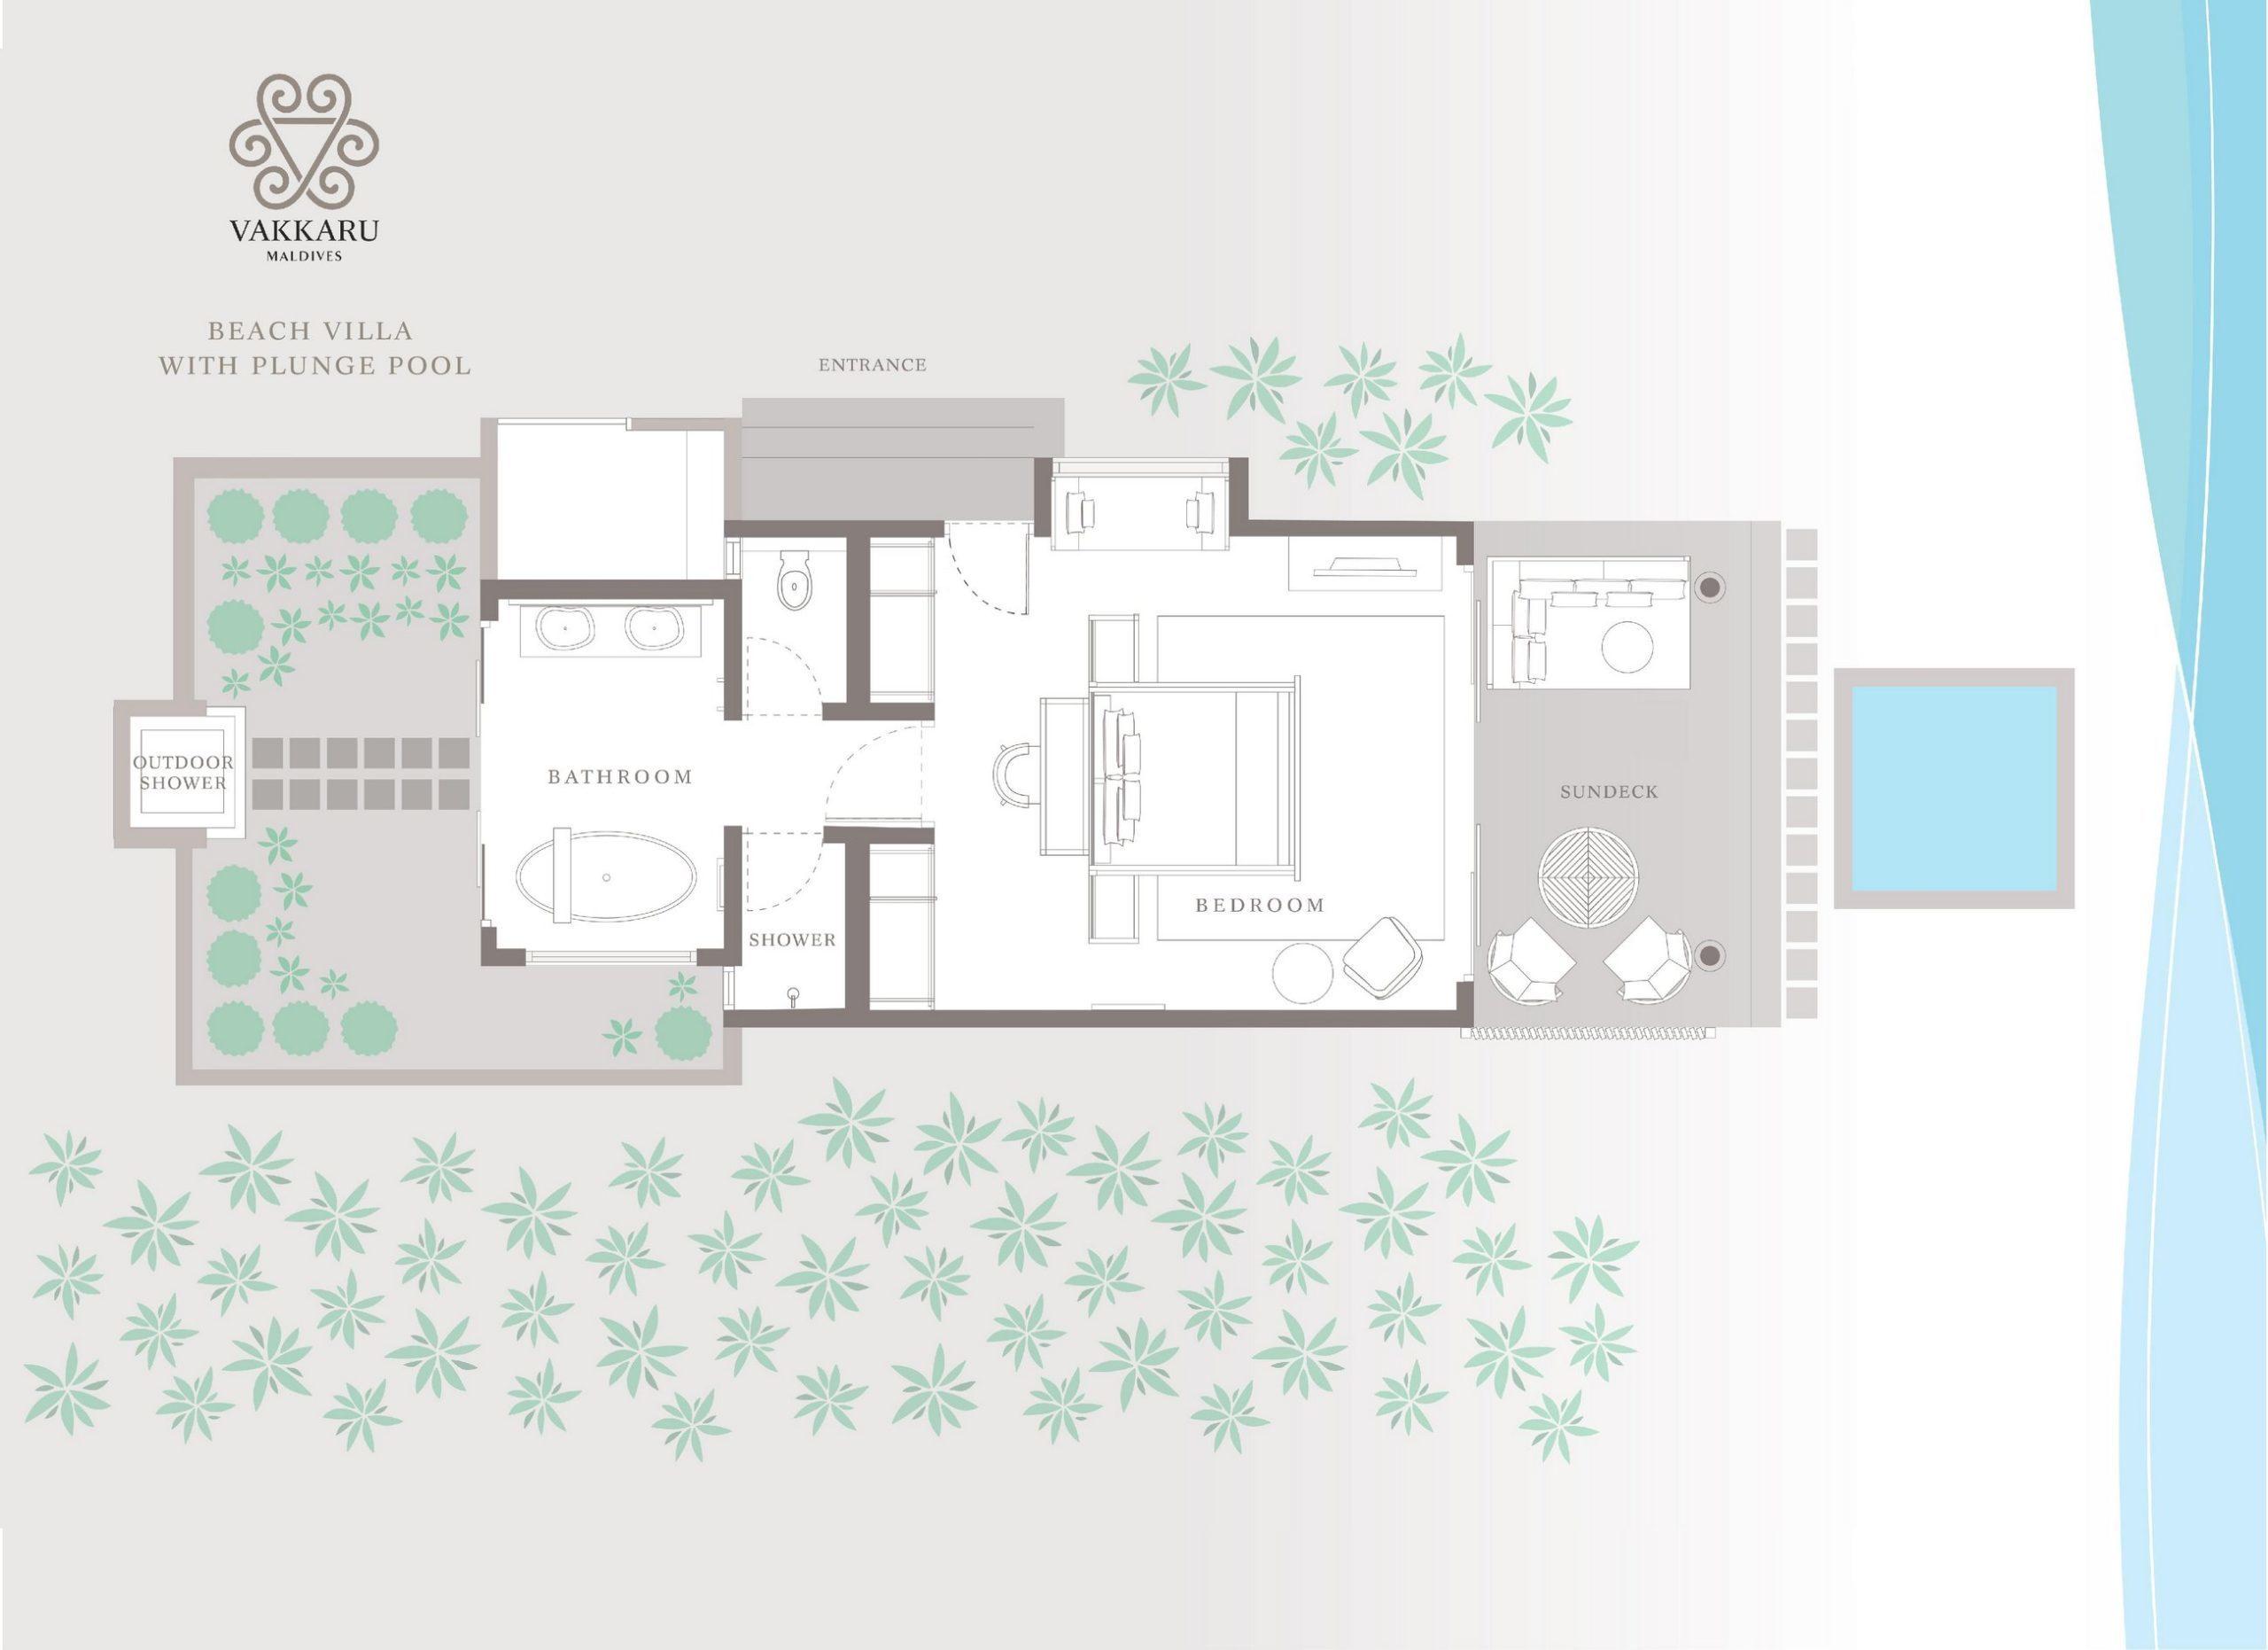 Мальдивы, отель Vakkaru Maldives, план-схема номера Beach Villa with Plunge Pool